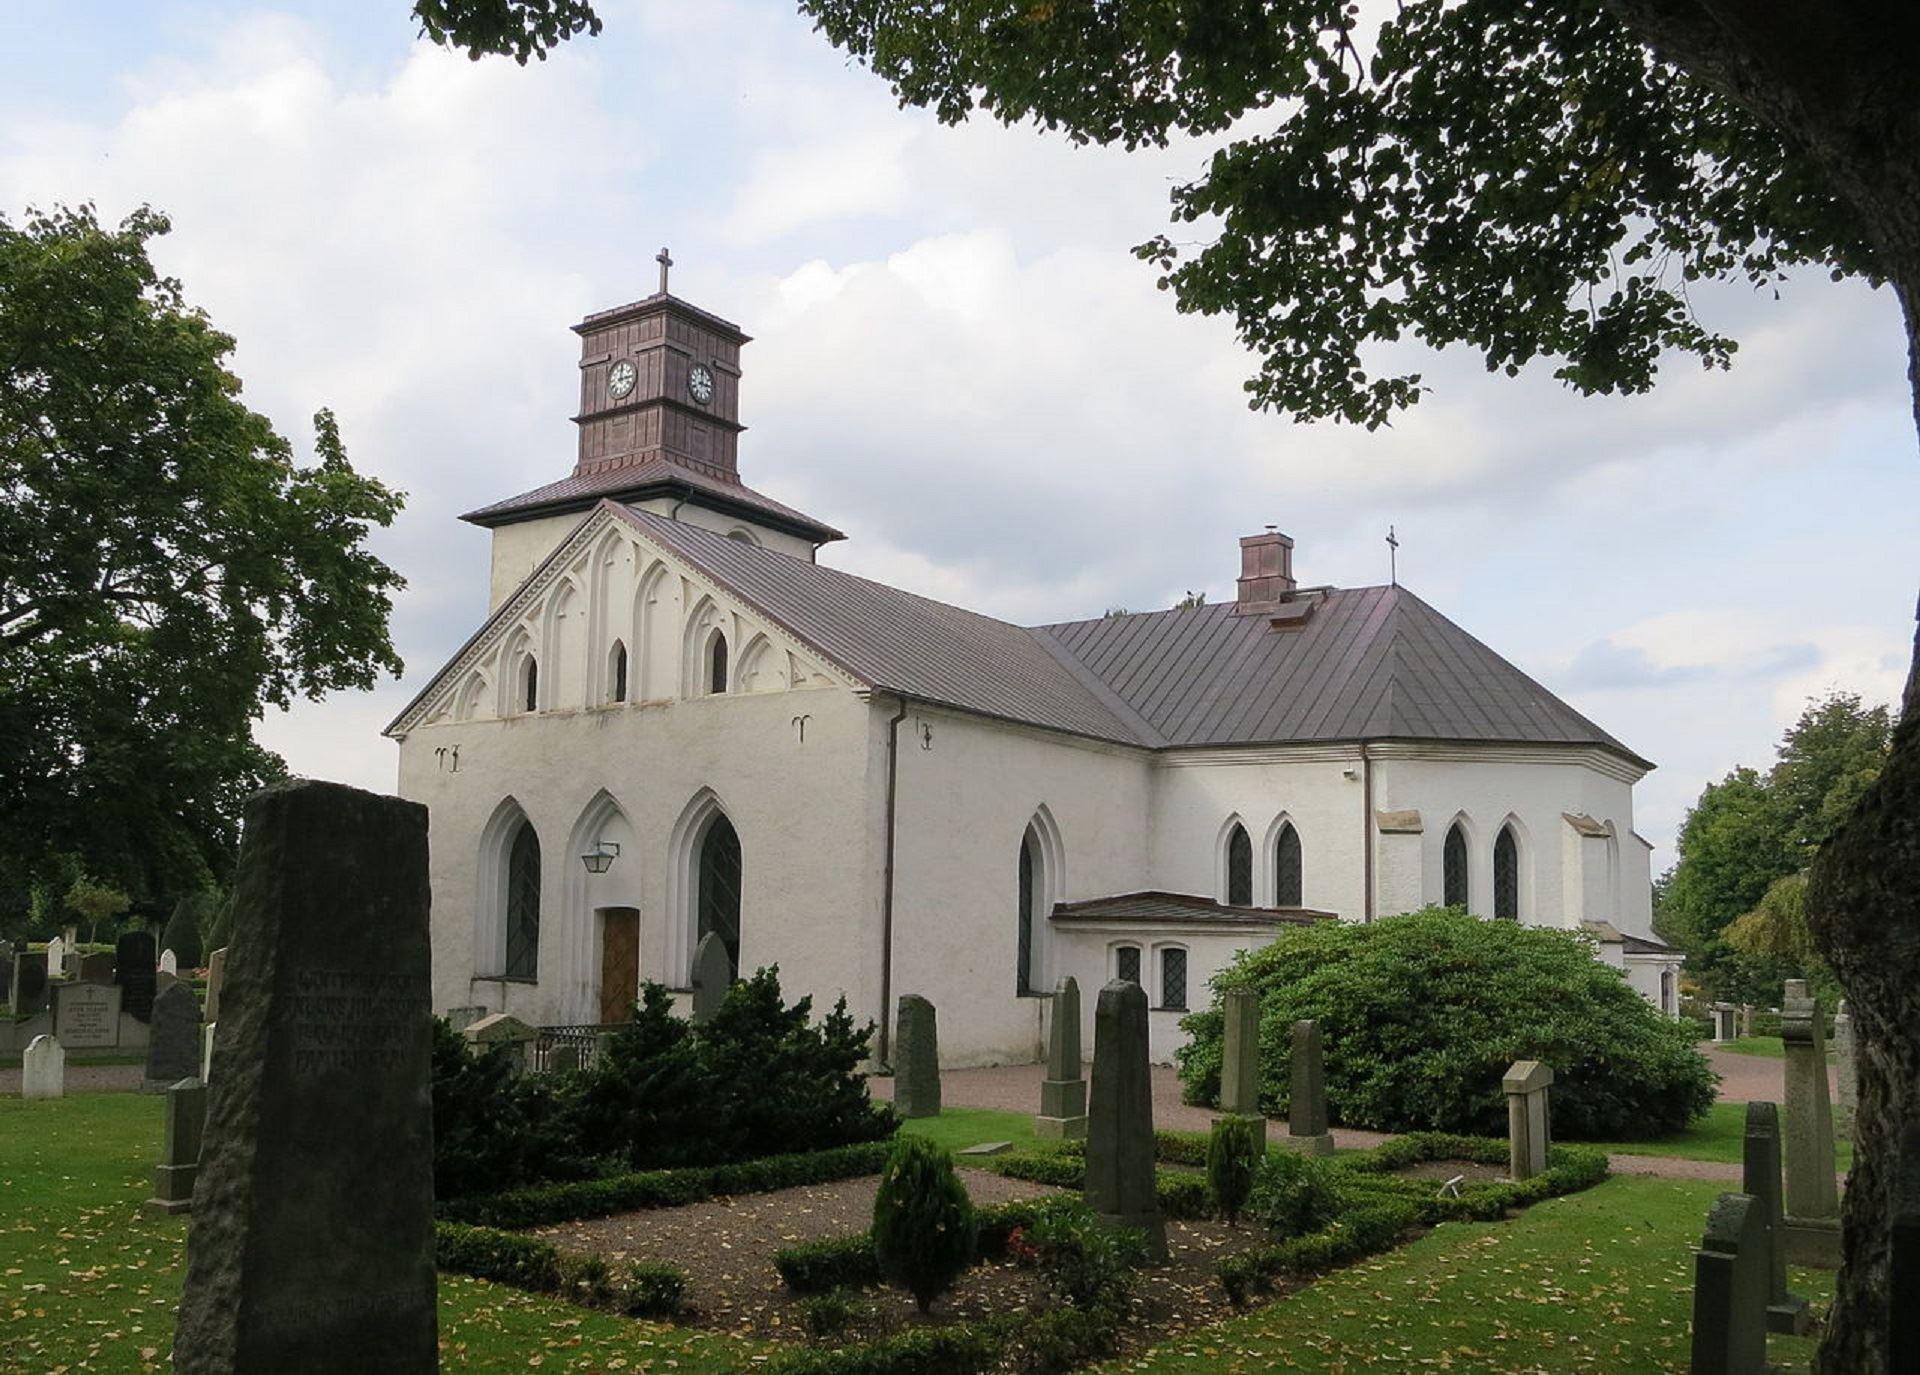 Strövelstorp Kirche